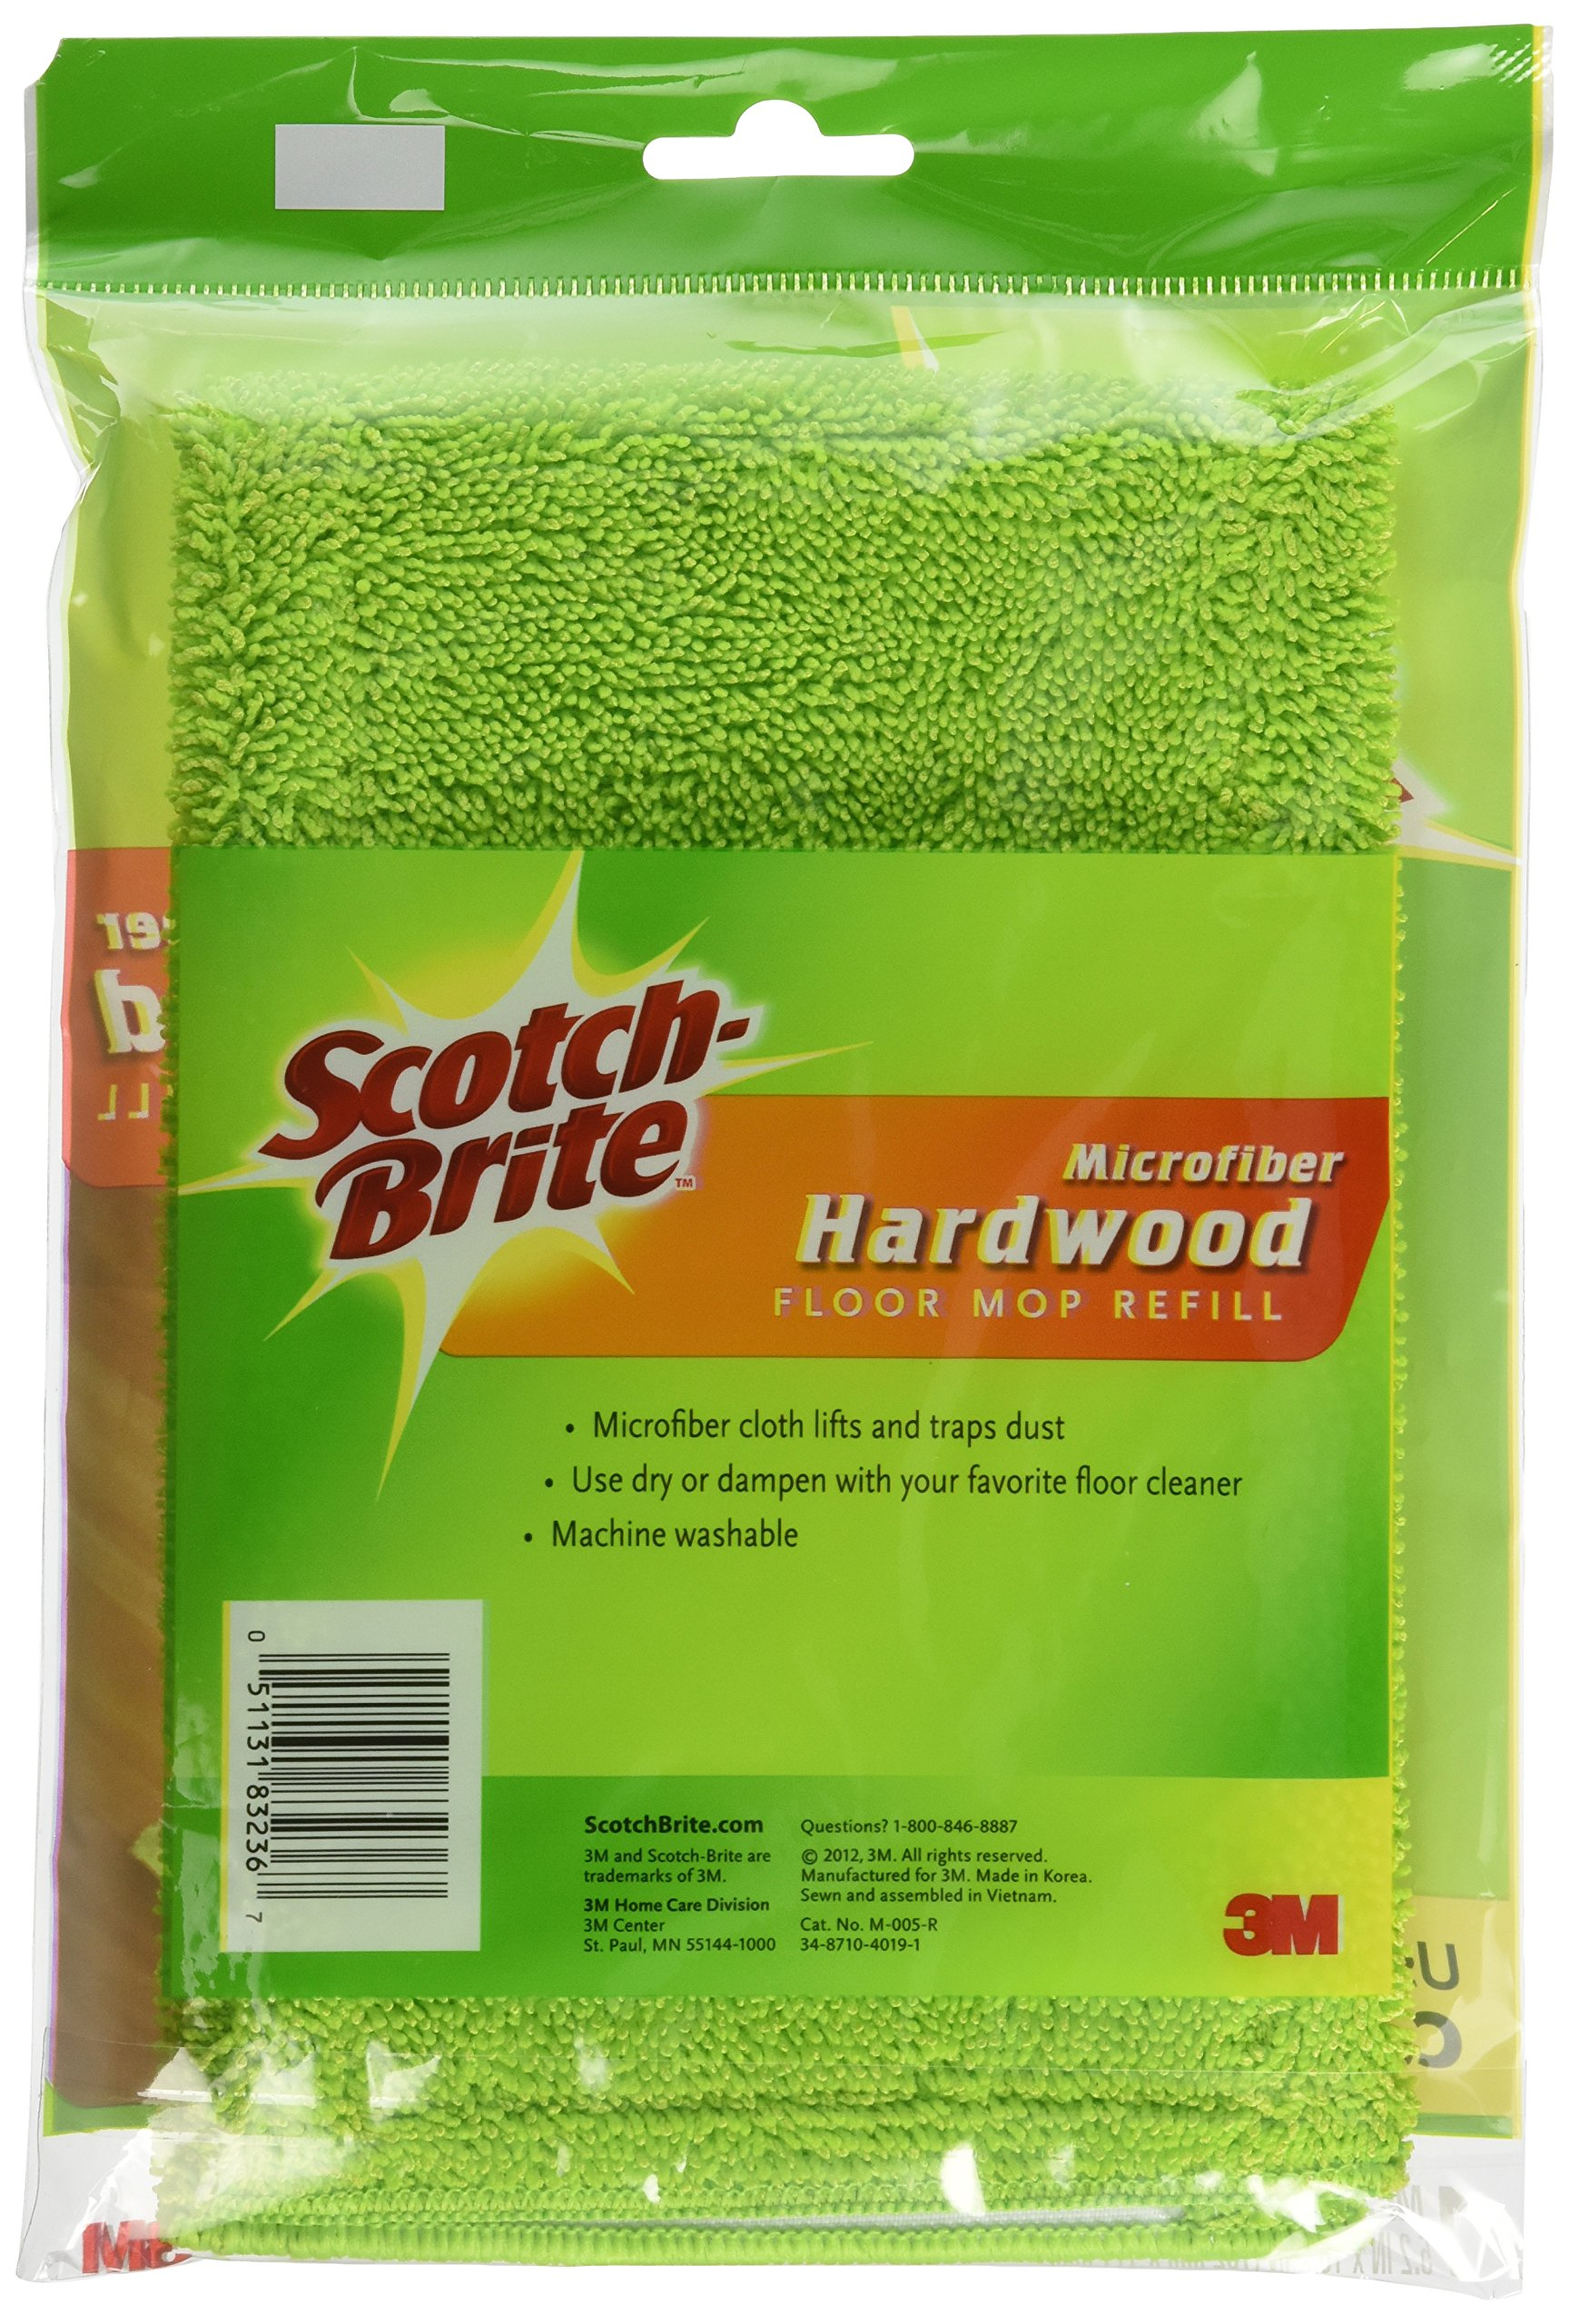 Scotch-Brite Microfiber Hardwood Floor Mop by 3M (Image #2)